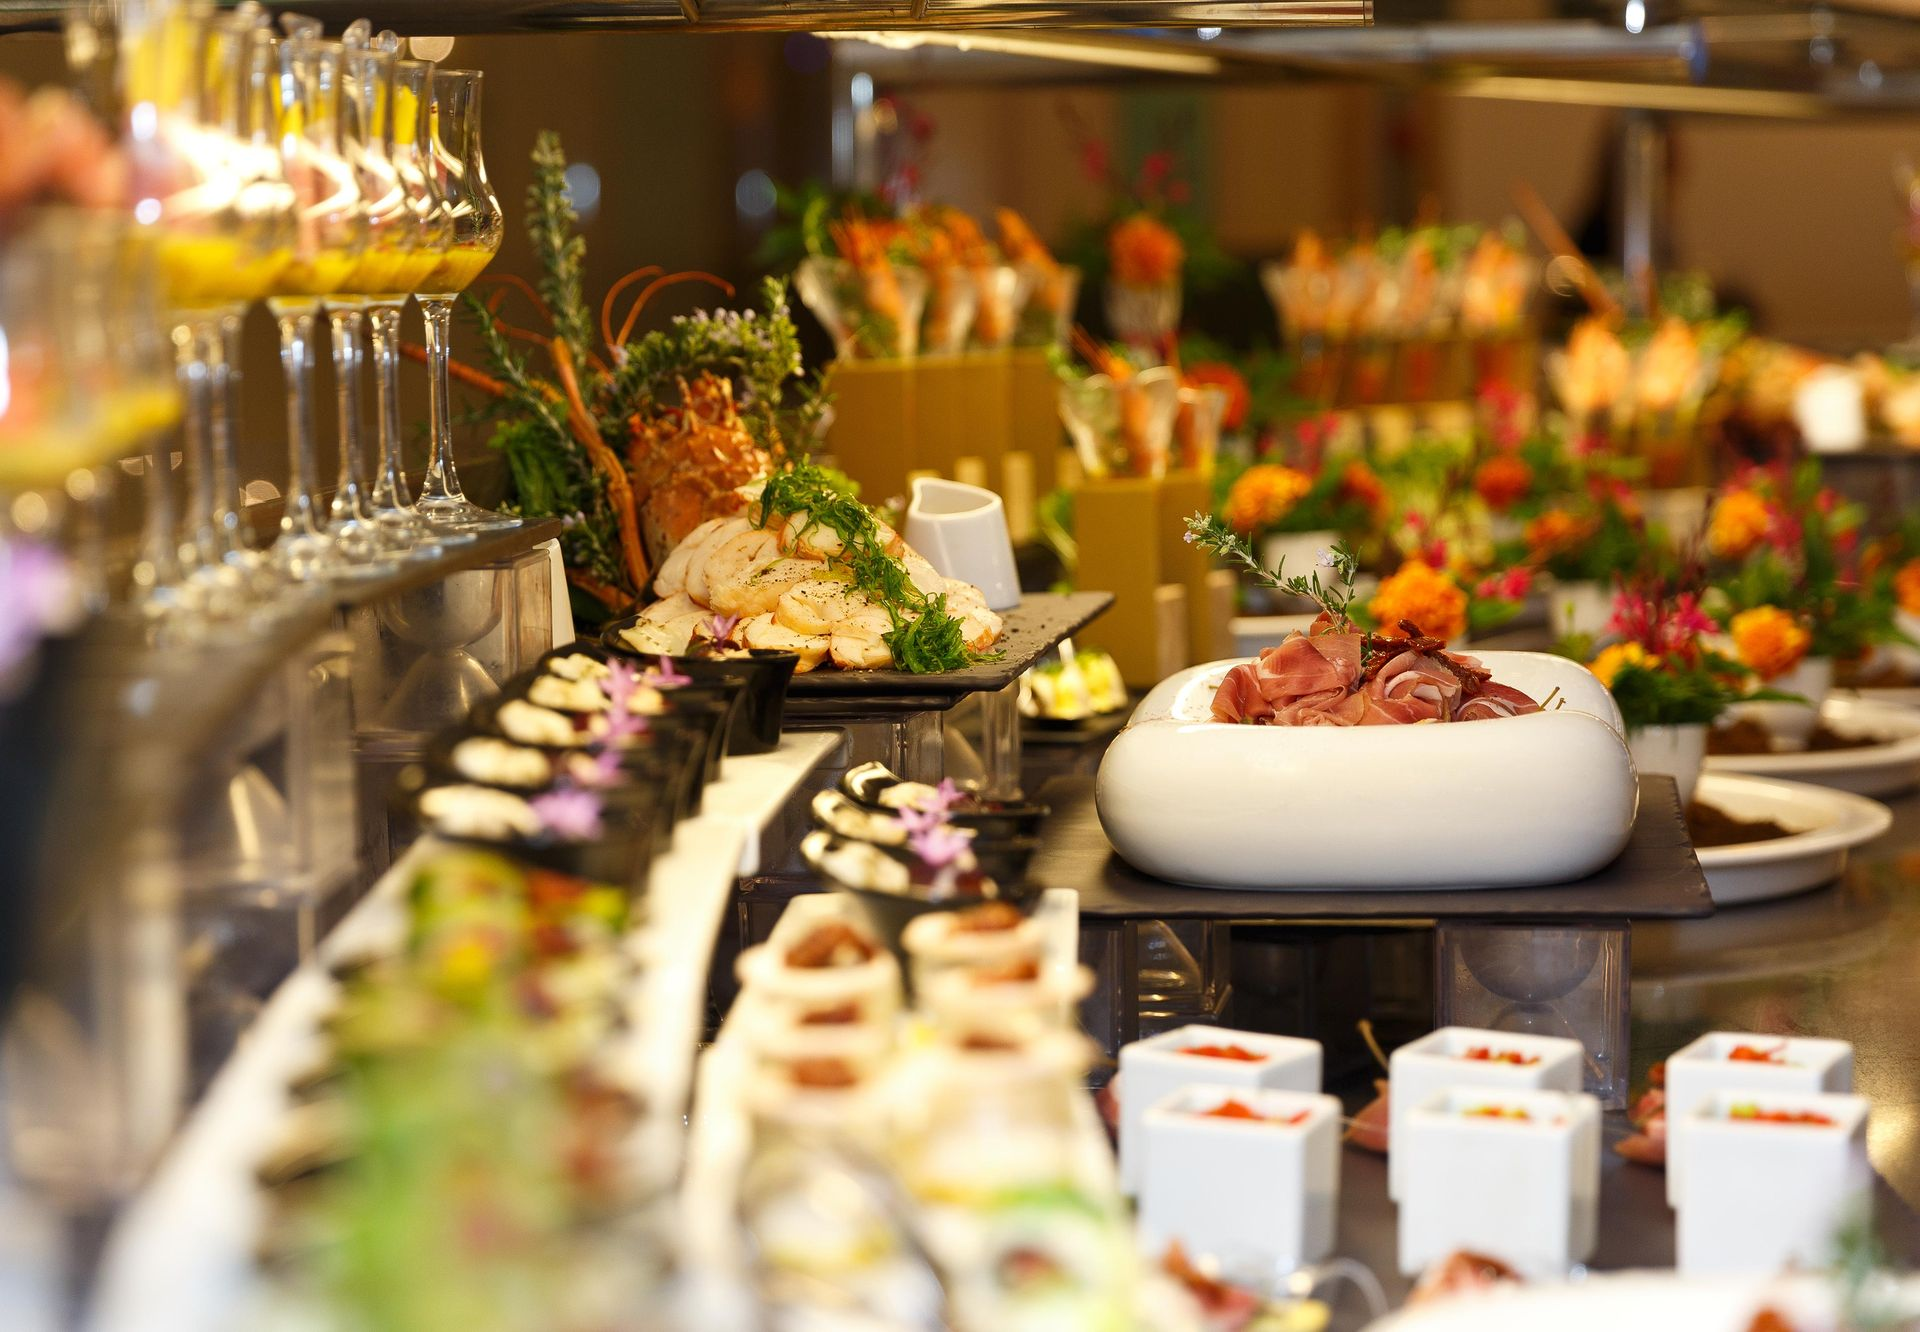 310_Buffet_Emerald_Restaurant_ELYSIUM_result